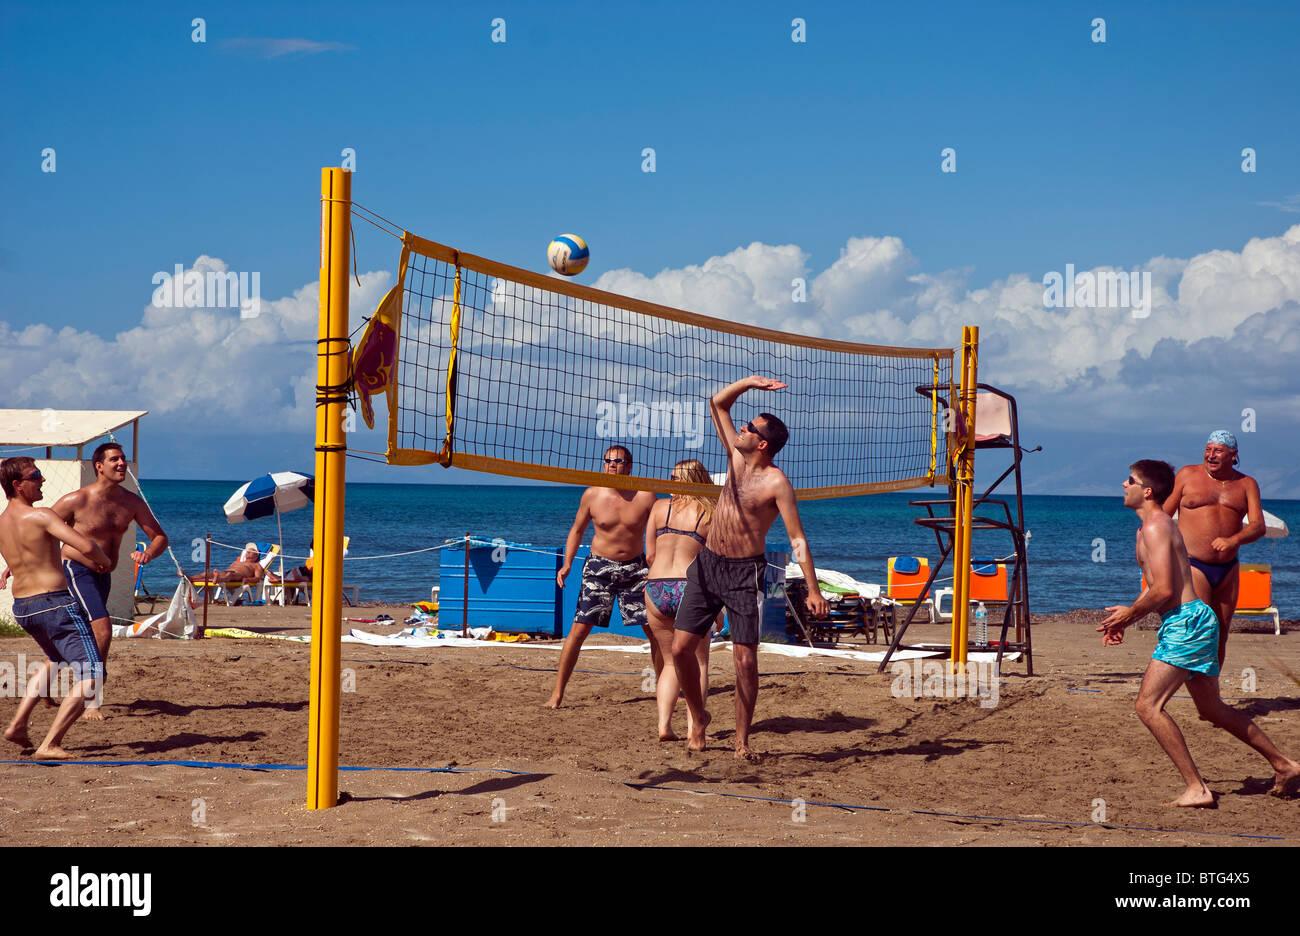 Volleyball players at  Roda Beach, Corfu, Ionian Islands Greece. - Stock Image